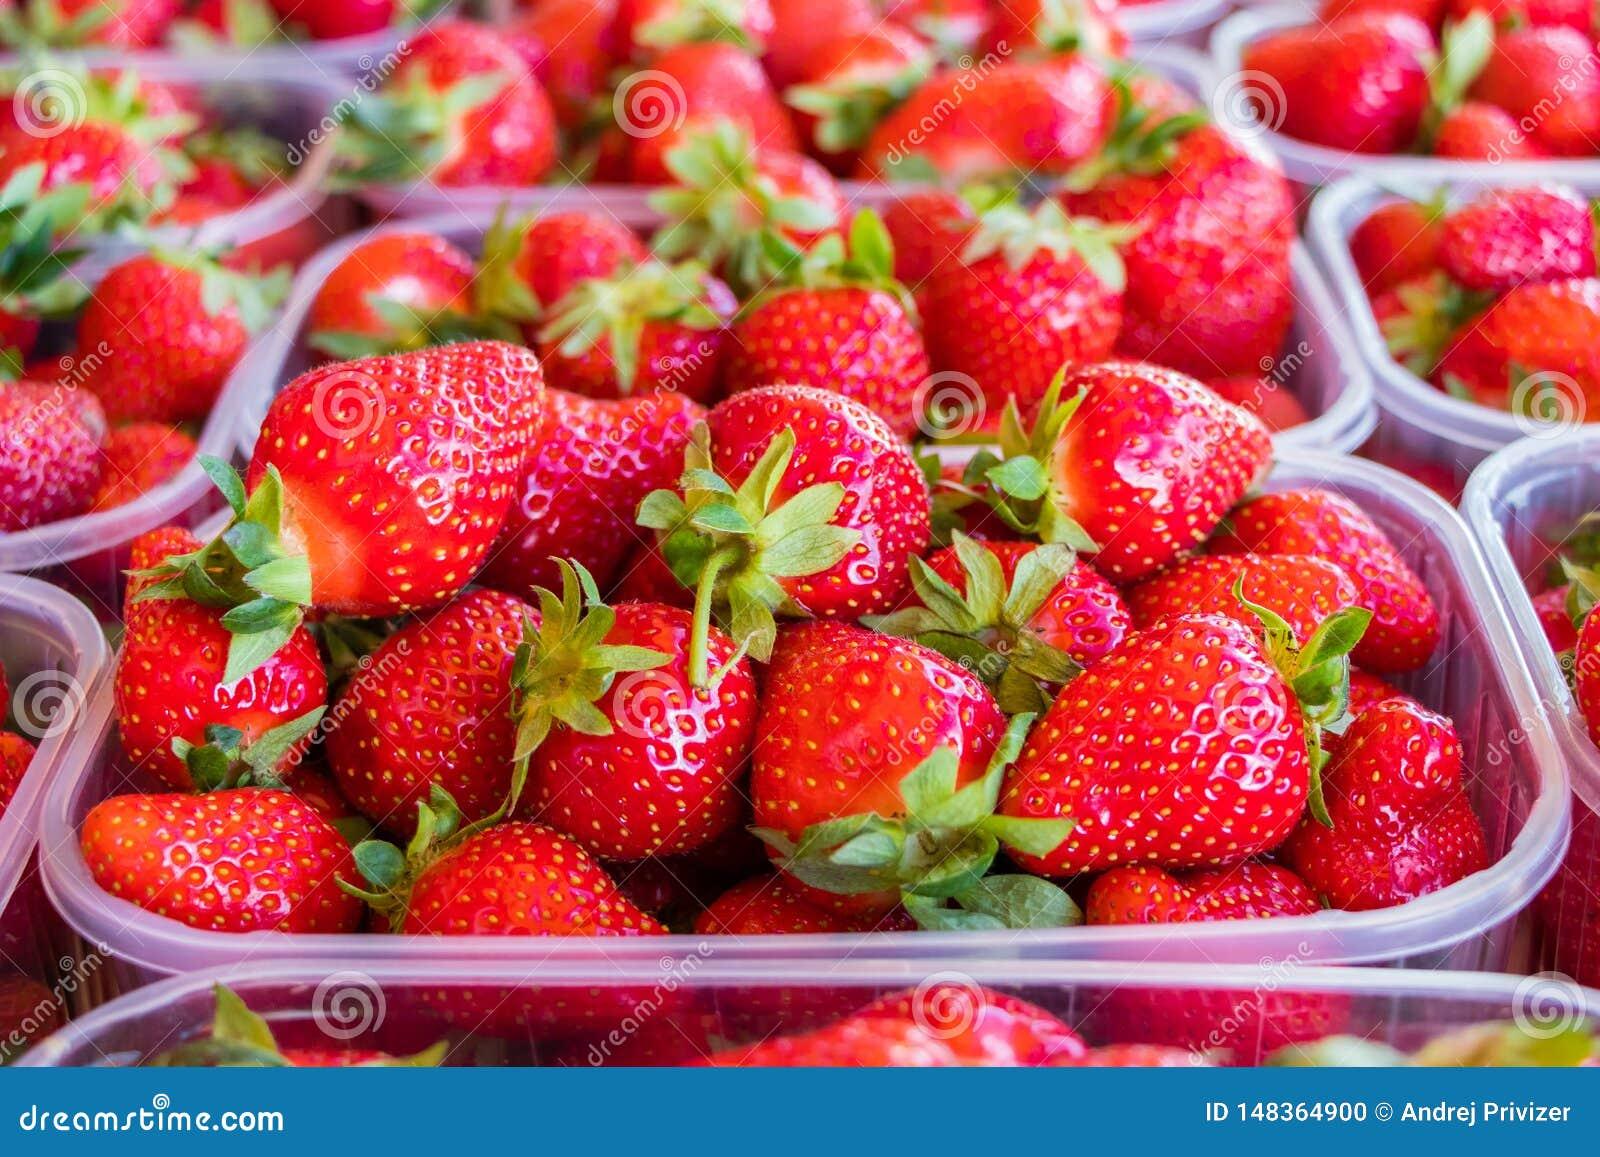 Fresh ripe strawberries in plastic boxes on market